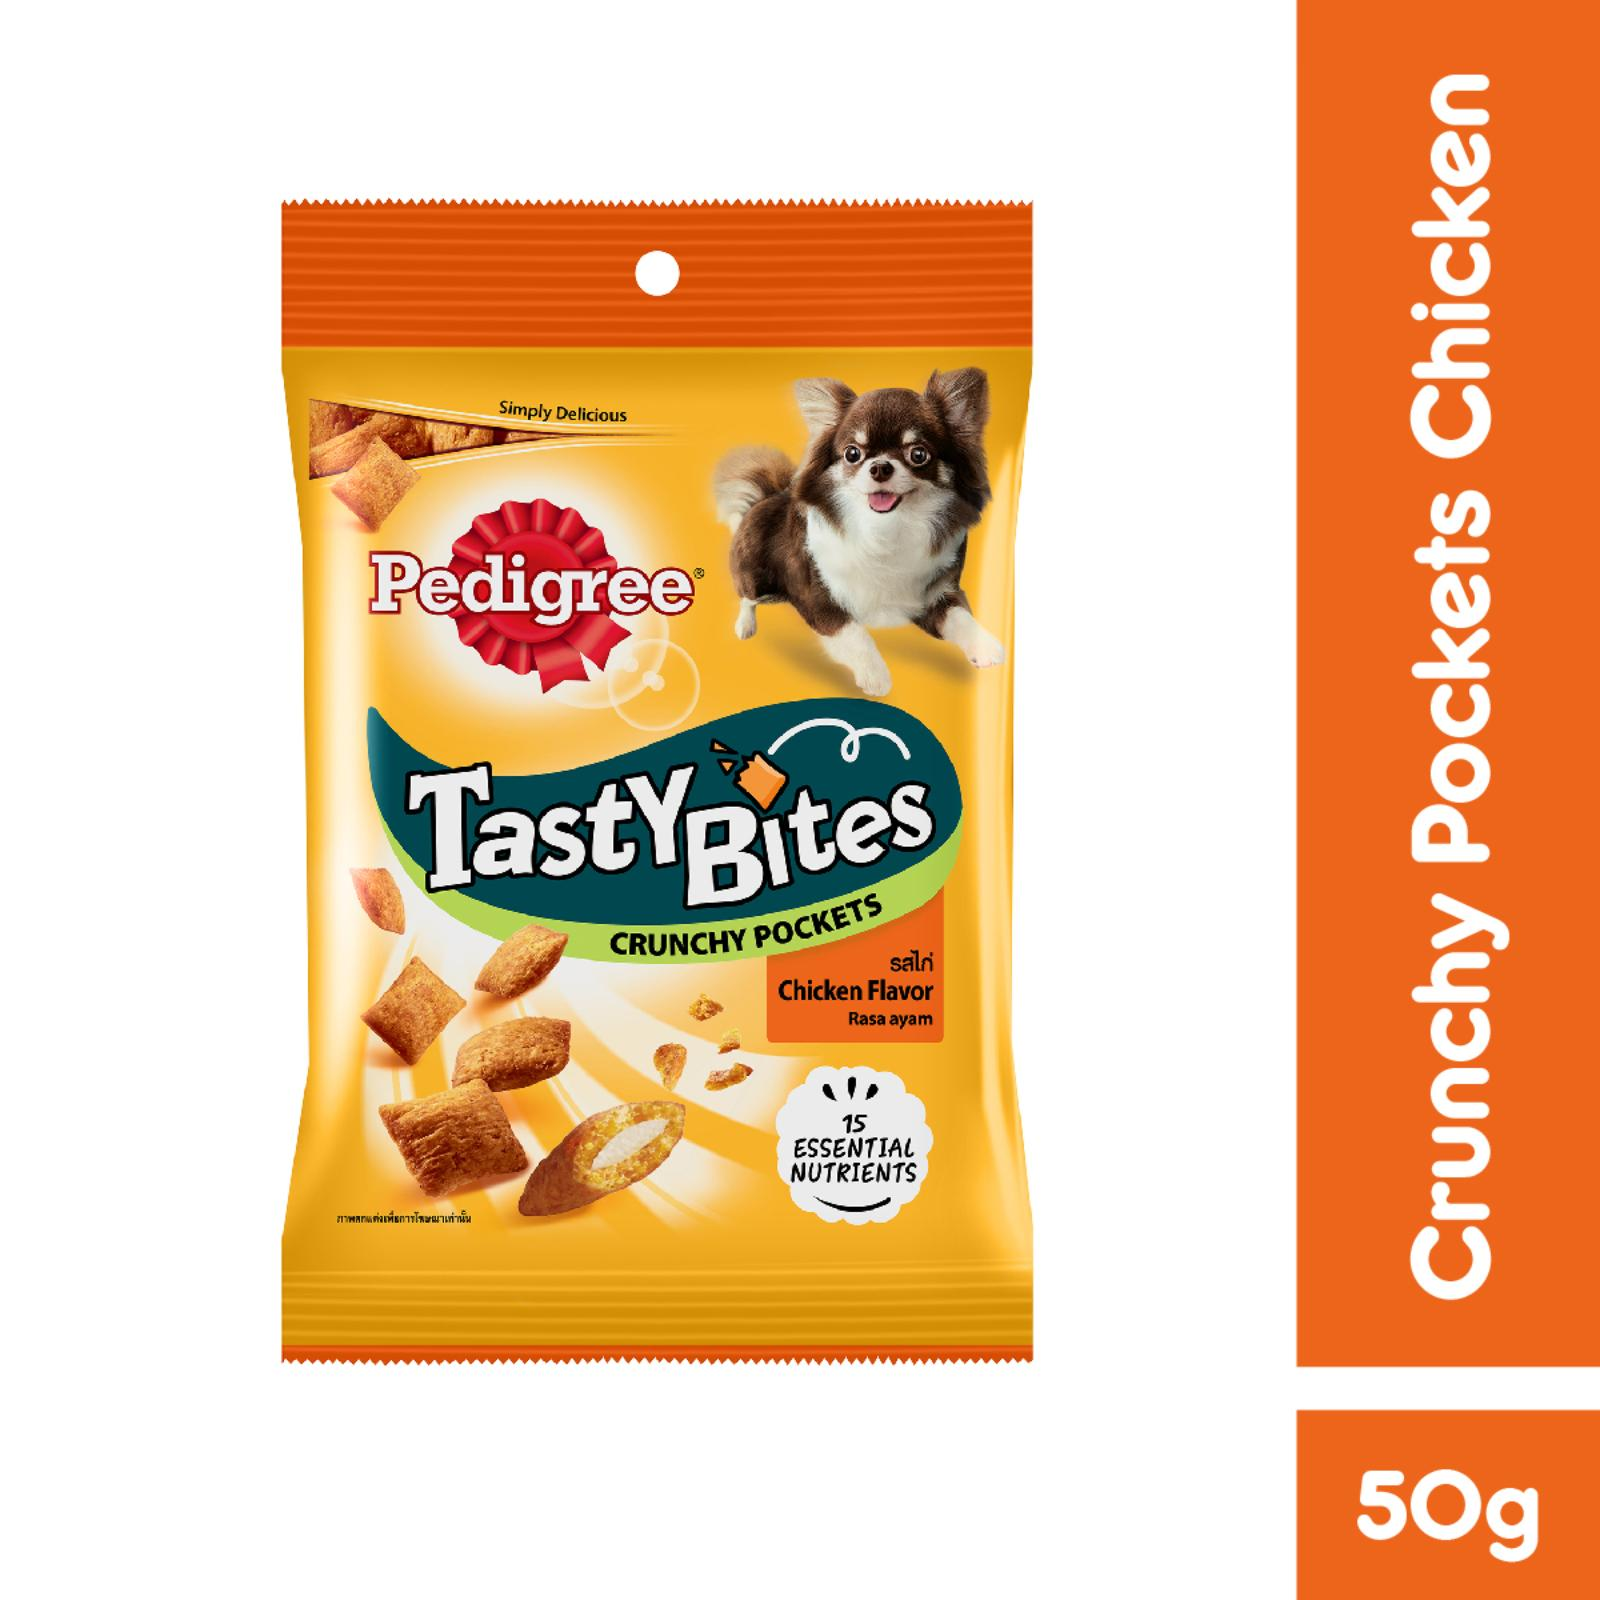 Pedigree Tasty Bites Crunchy Pockets Chicken